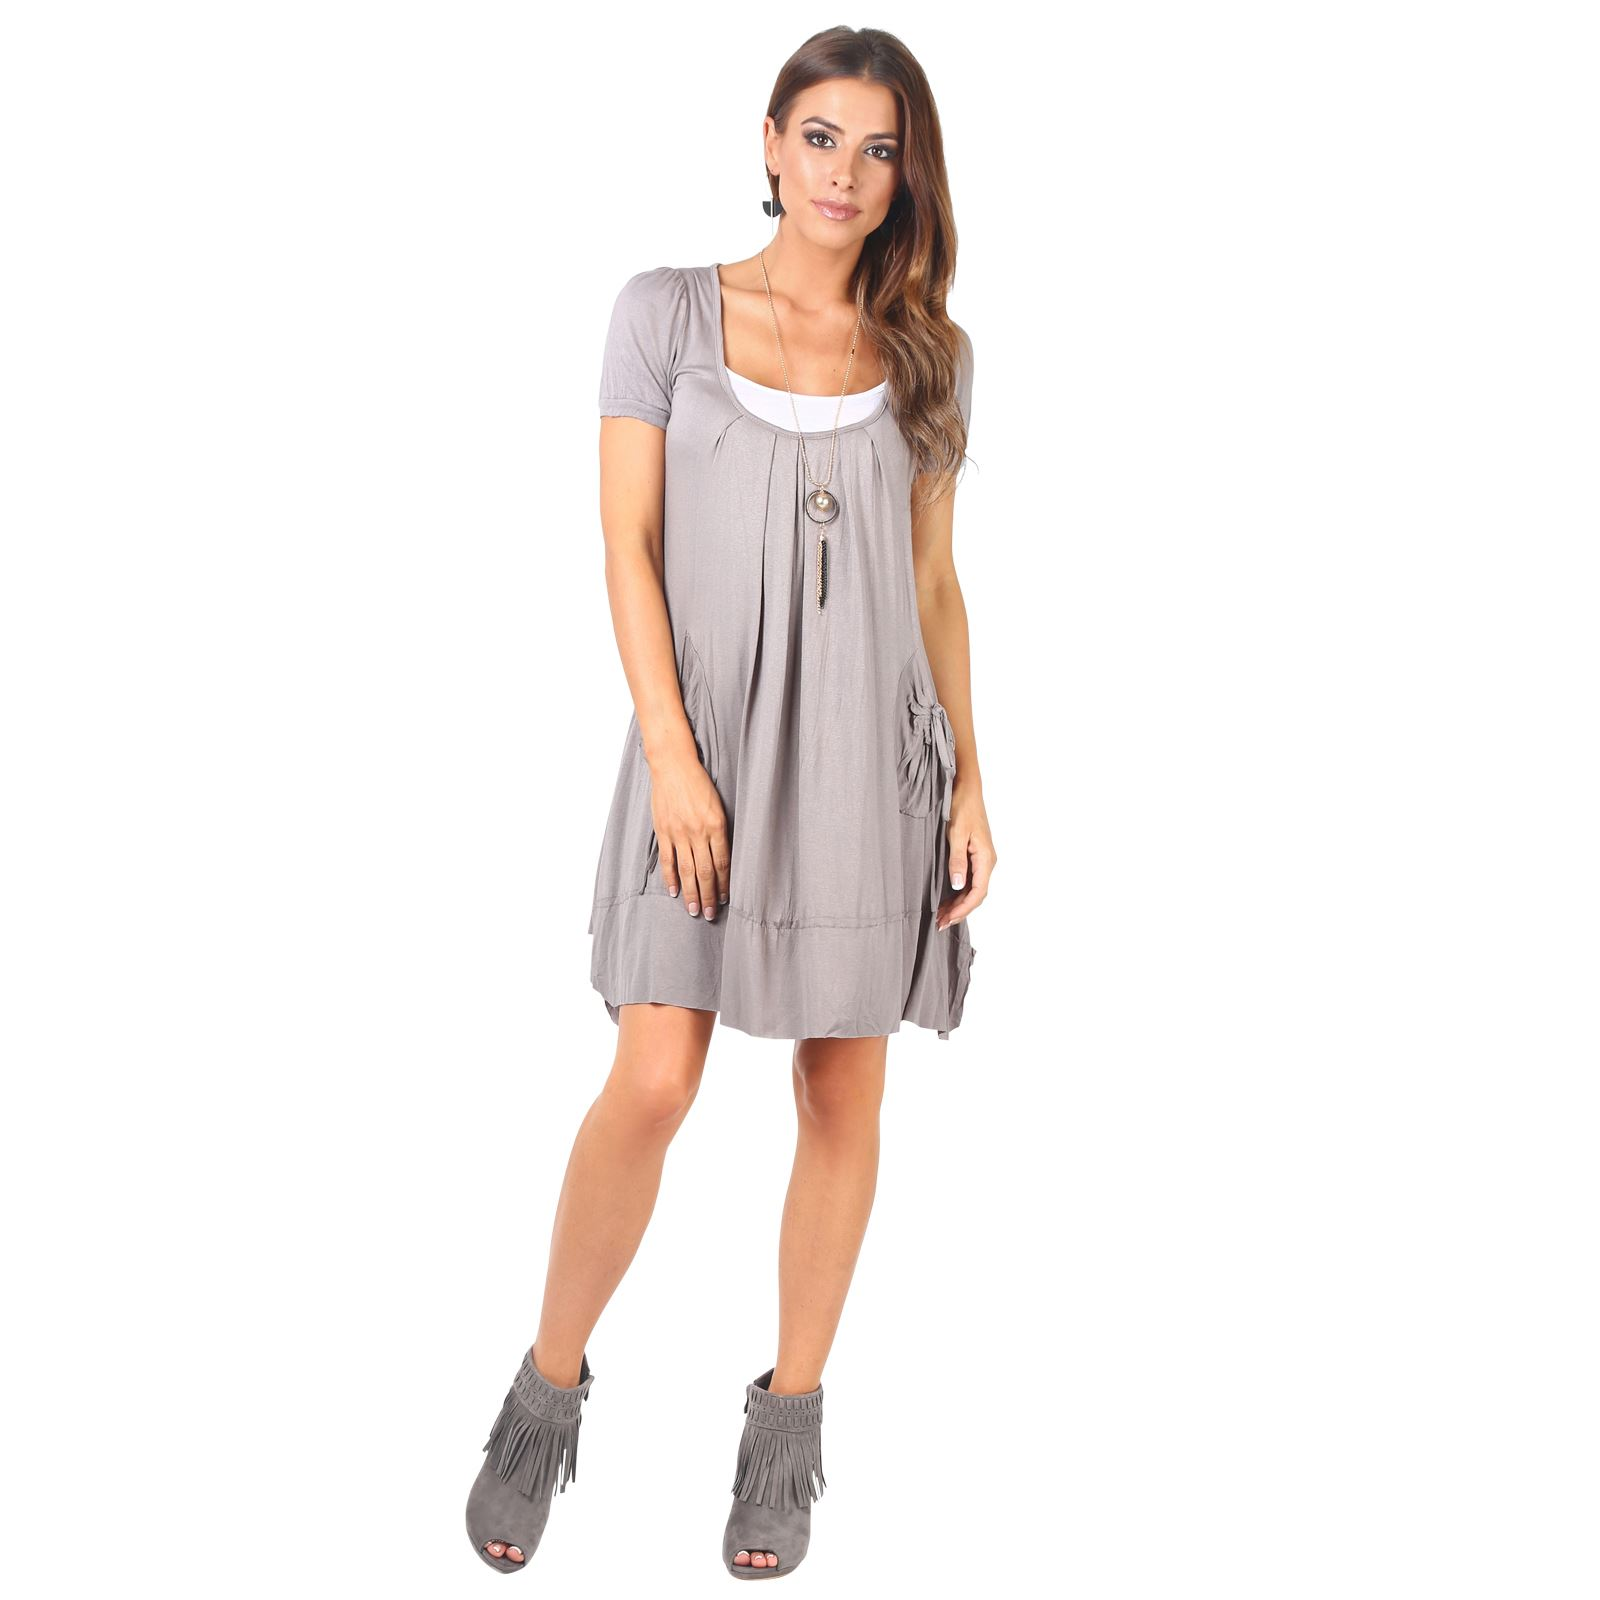 KRISP-Women-2-in-1-Boho-Gypsy-Tunic-Dress-Top-Tee-Jersey-Pleated-A-Line-Necklace thumbnail 15